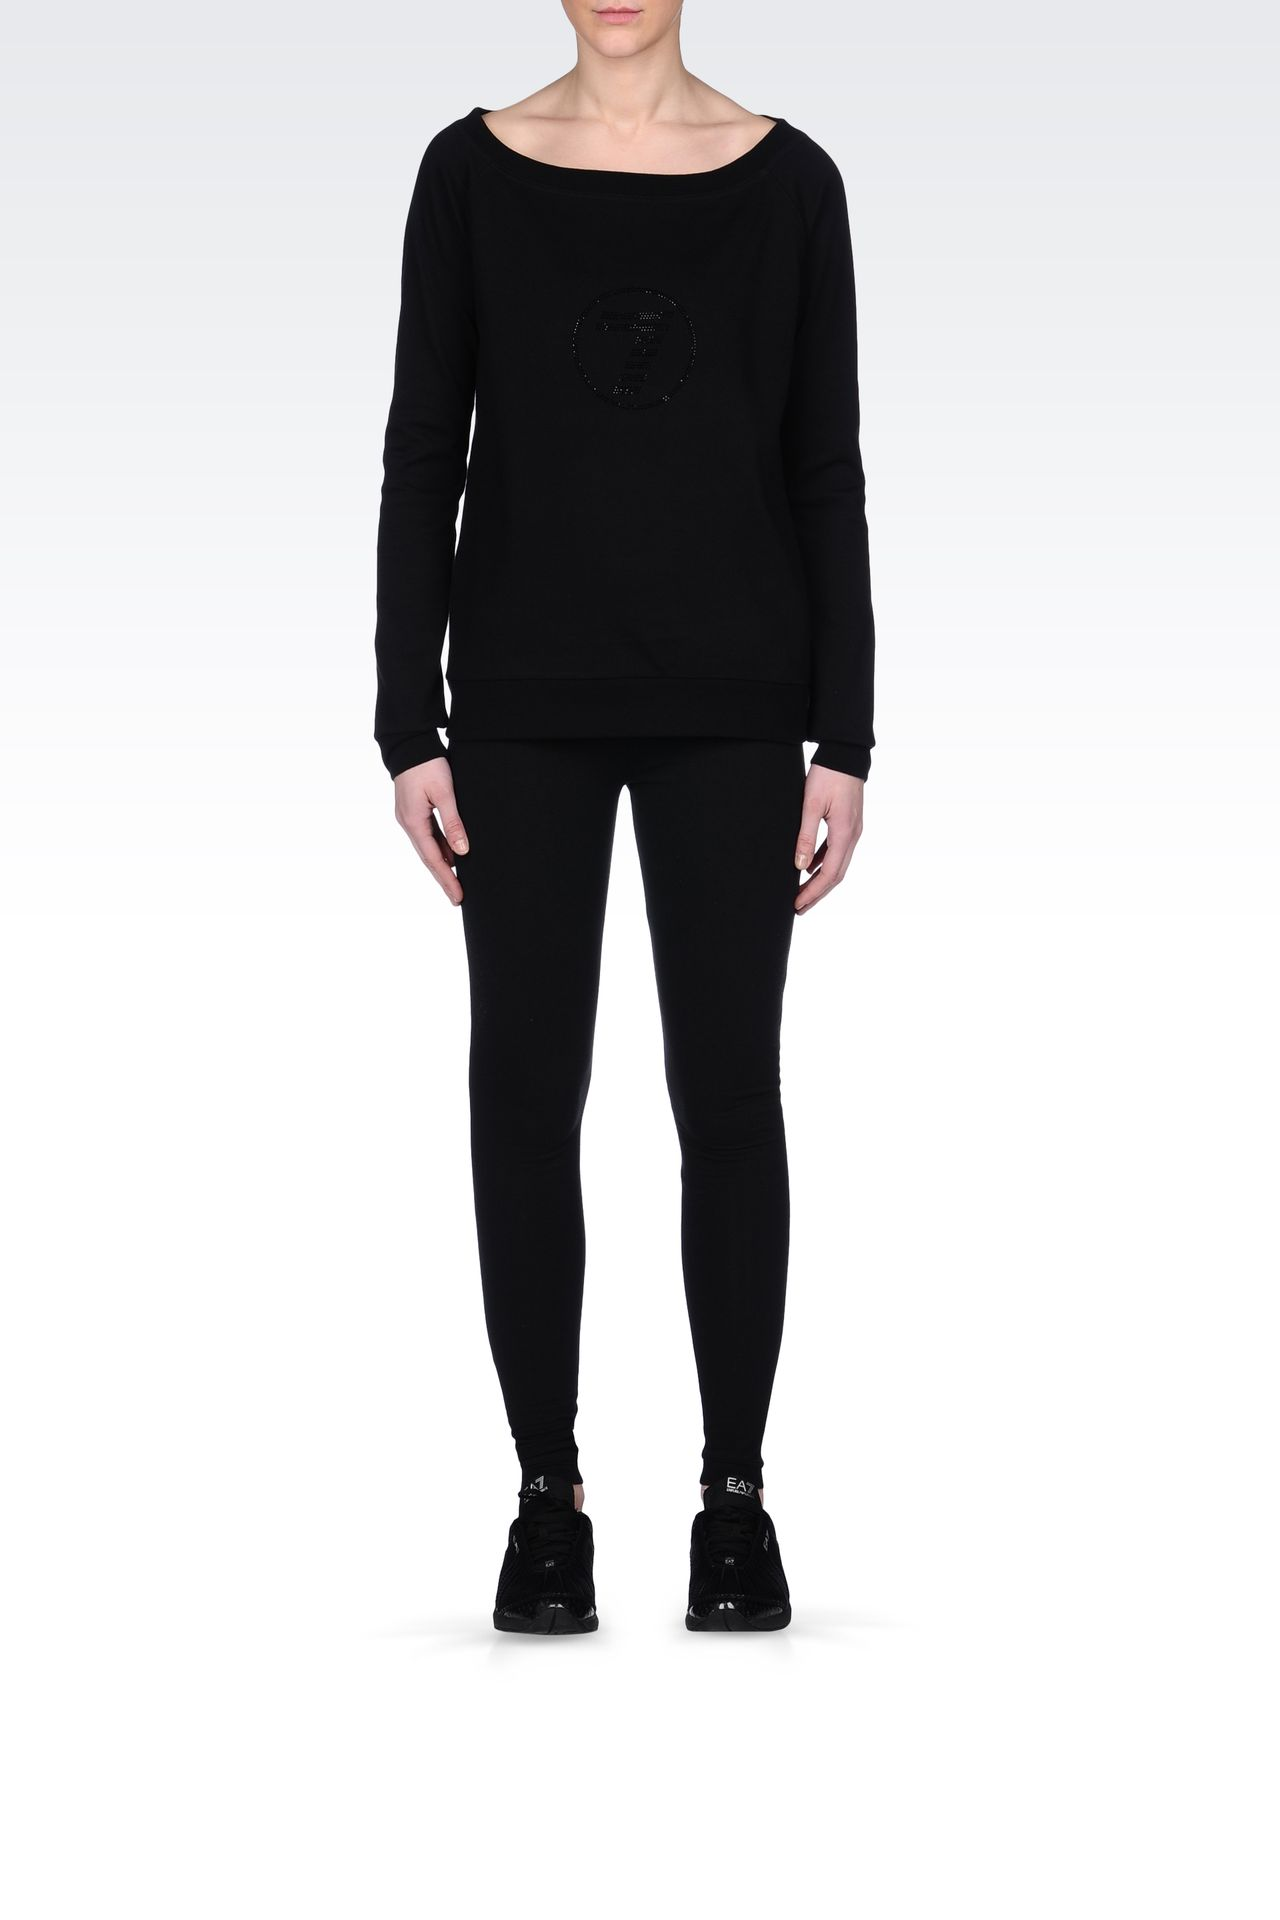 STRETCH COTTON LEGGINGS WITH LOGO: Leggings Women by Armani - 0